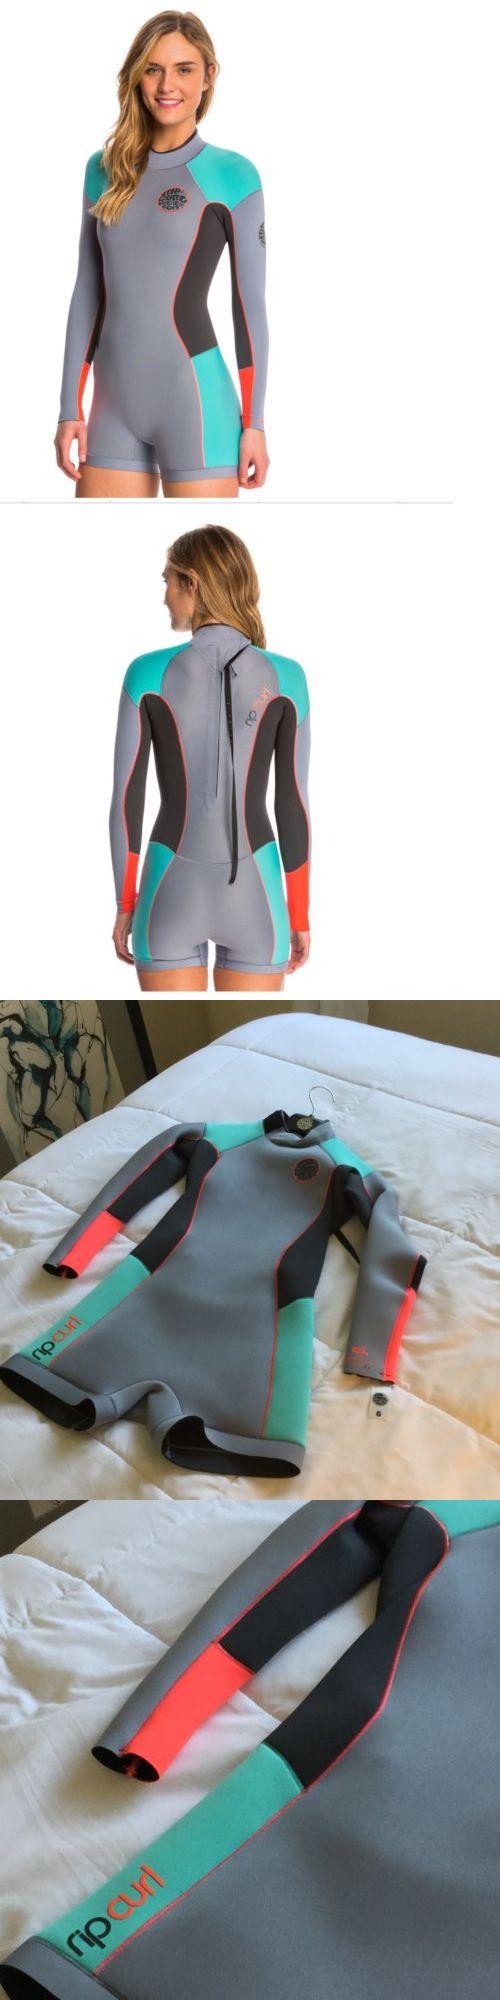 Women 47356: Rip Curl Size 8 Spring Suit Wetsuit Surfboard Longboard Roxy 110 To 130 Lbs -> BUY IT NOW ONLY: $49.99 on eBay!